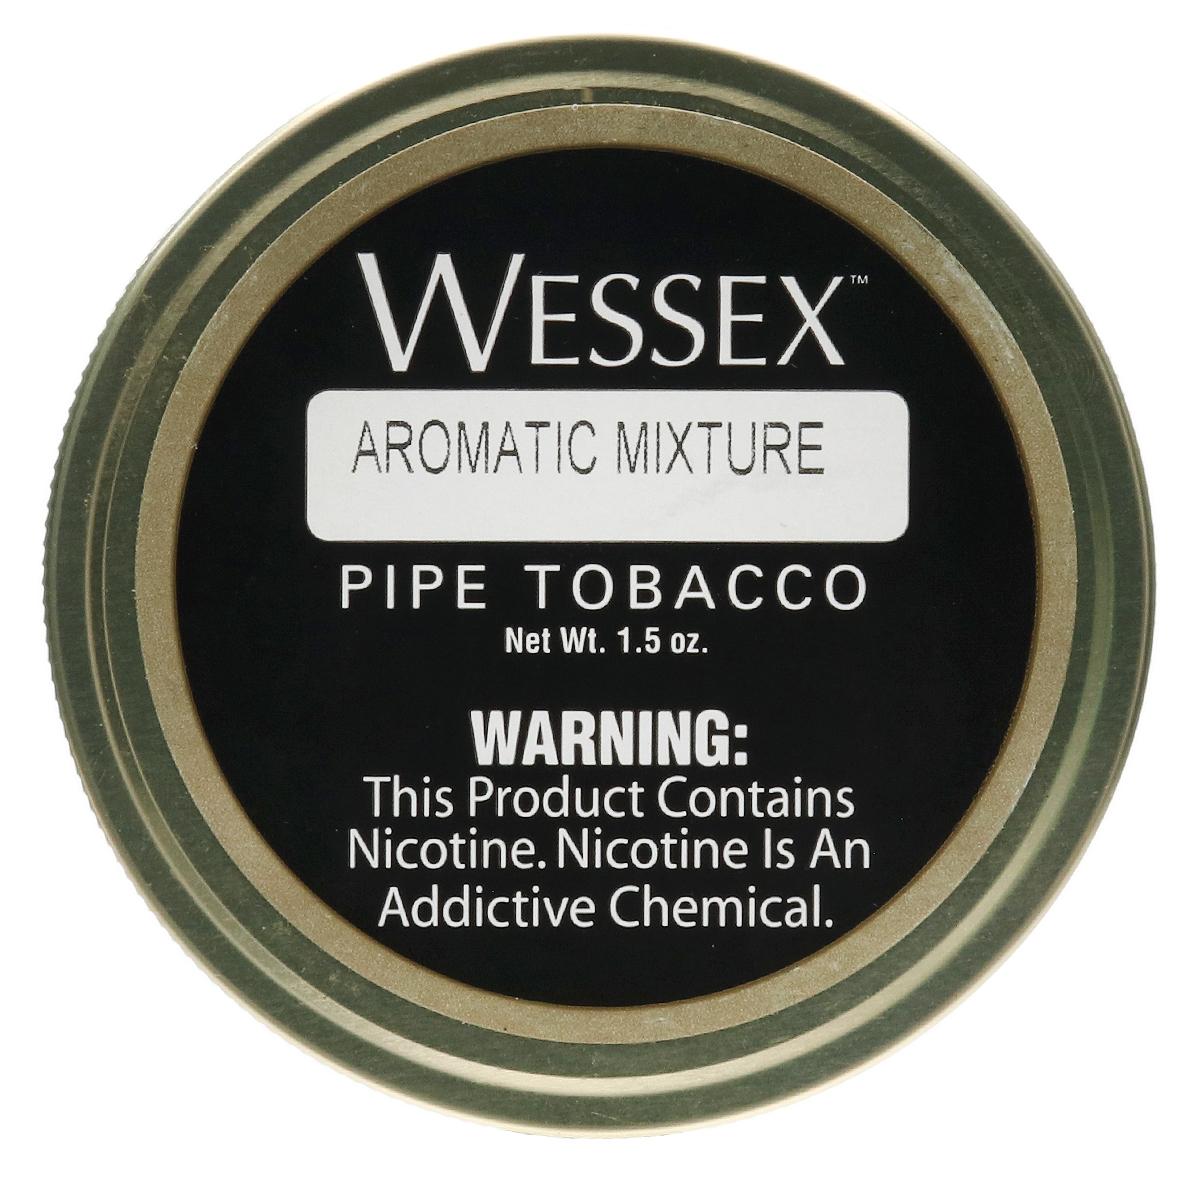 Wessex Aromatic Mixture 1.5oz